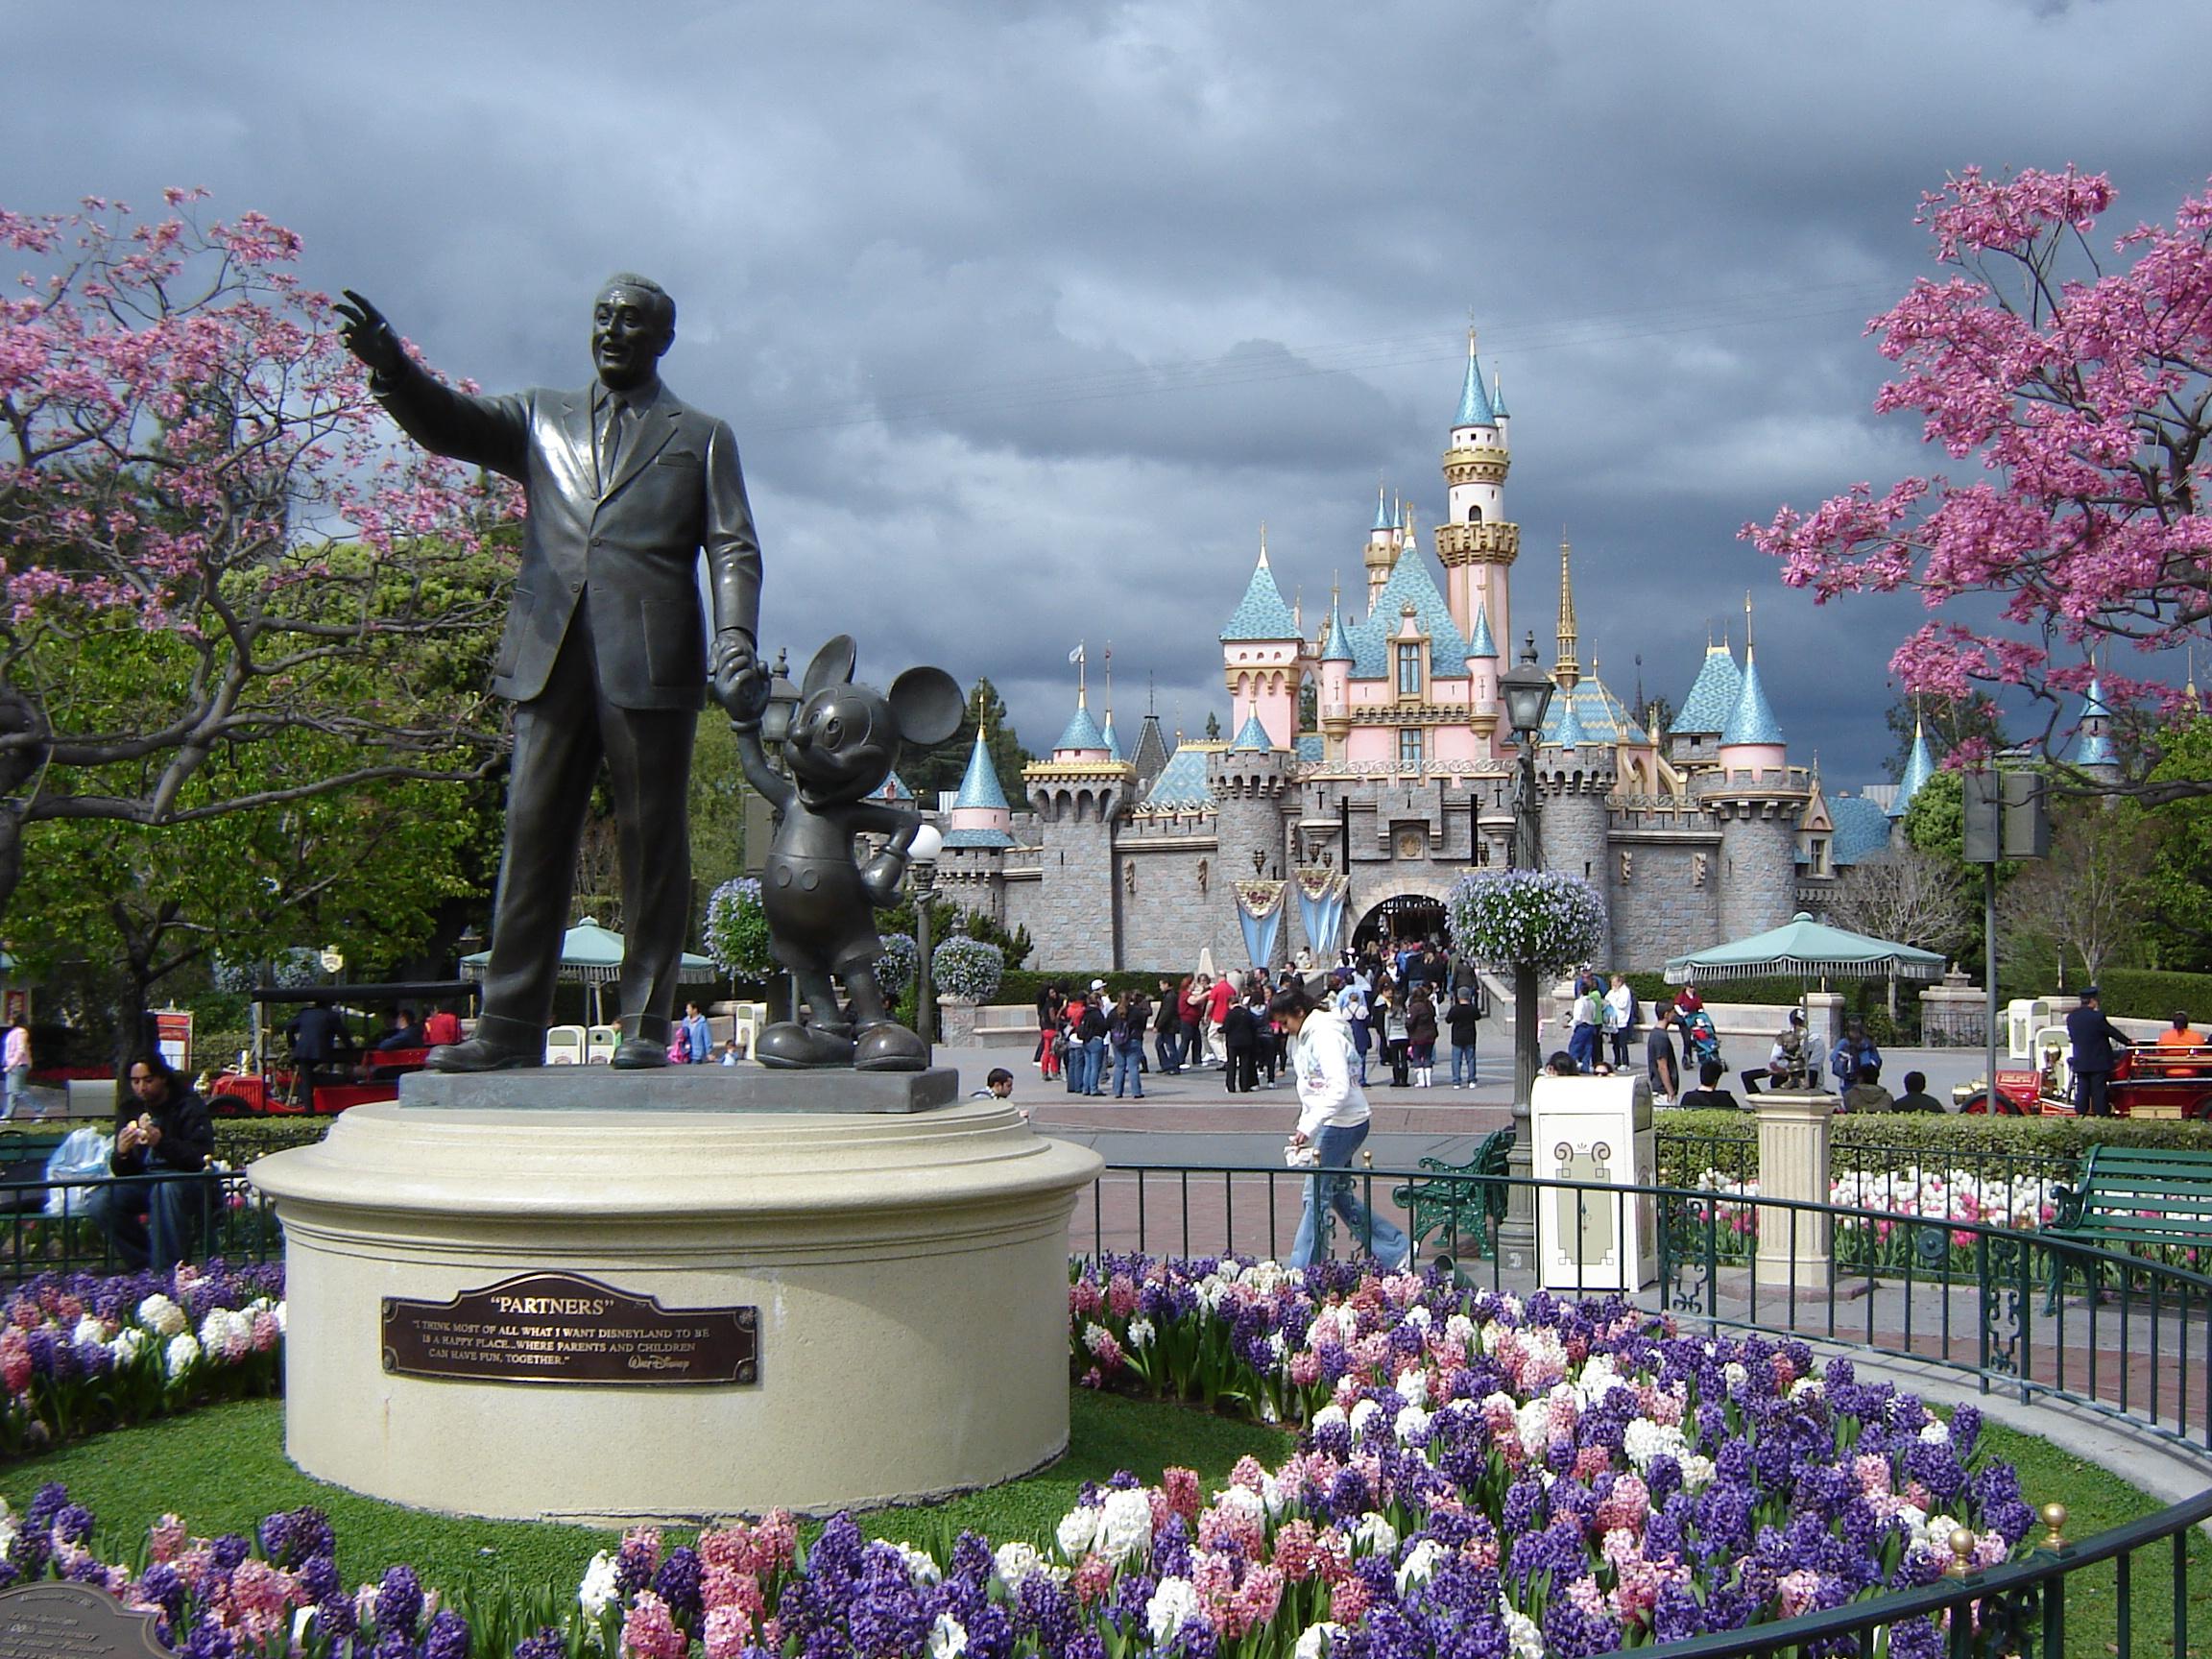 Walt Disney Partners Statue Disneyland Ca Image